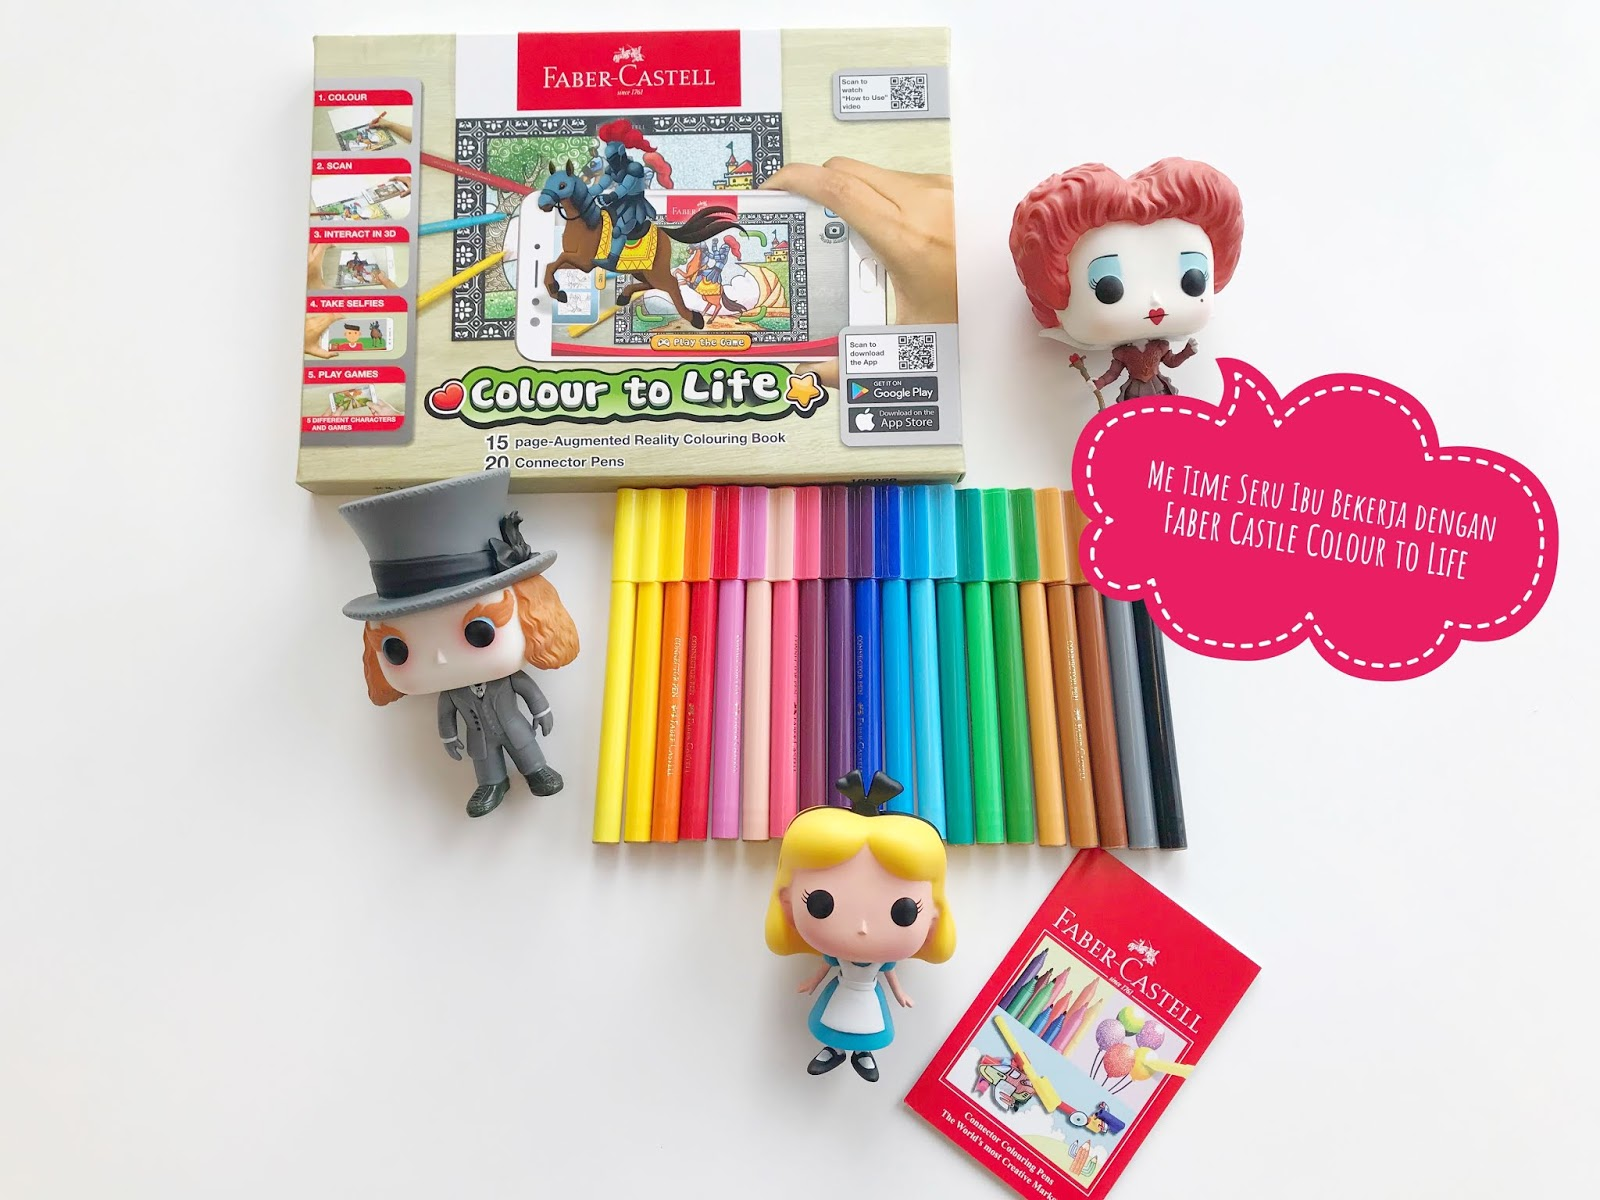 Me Time Seru Ibu Bekerja Dengan Faber Castell Colour To Life